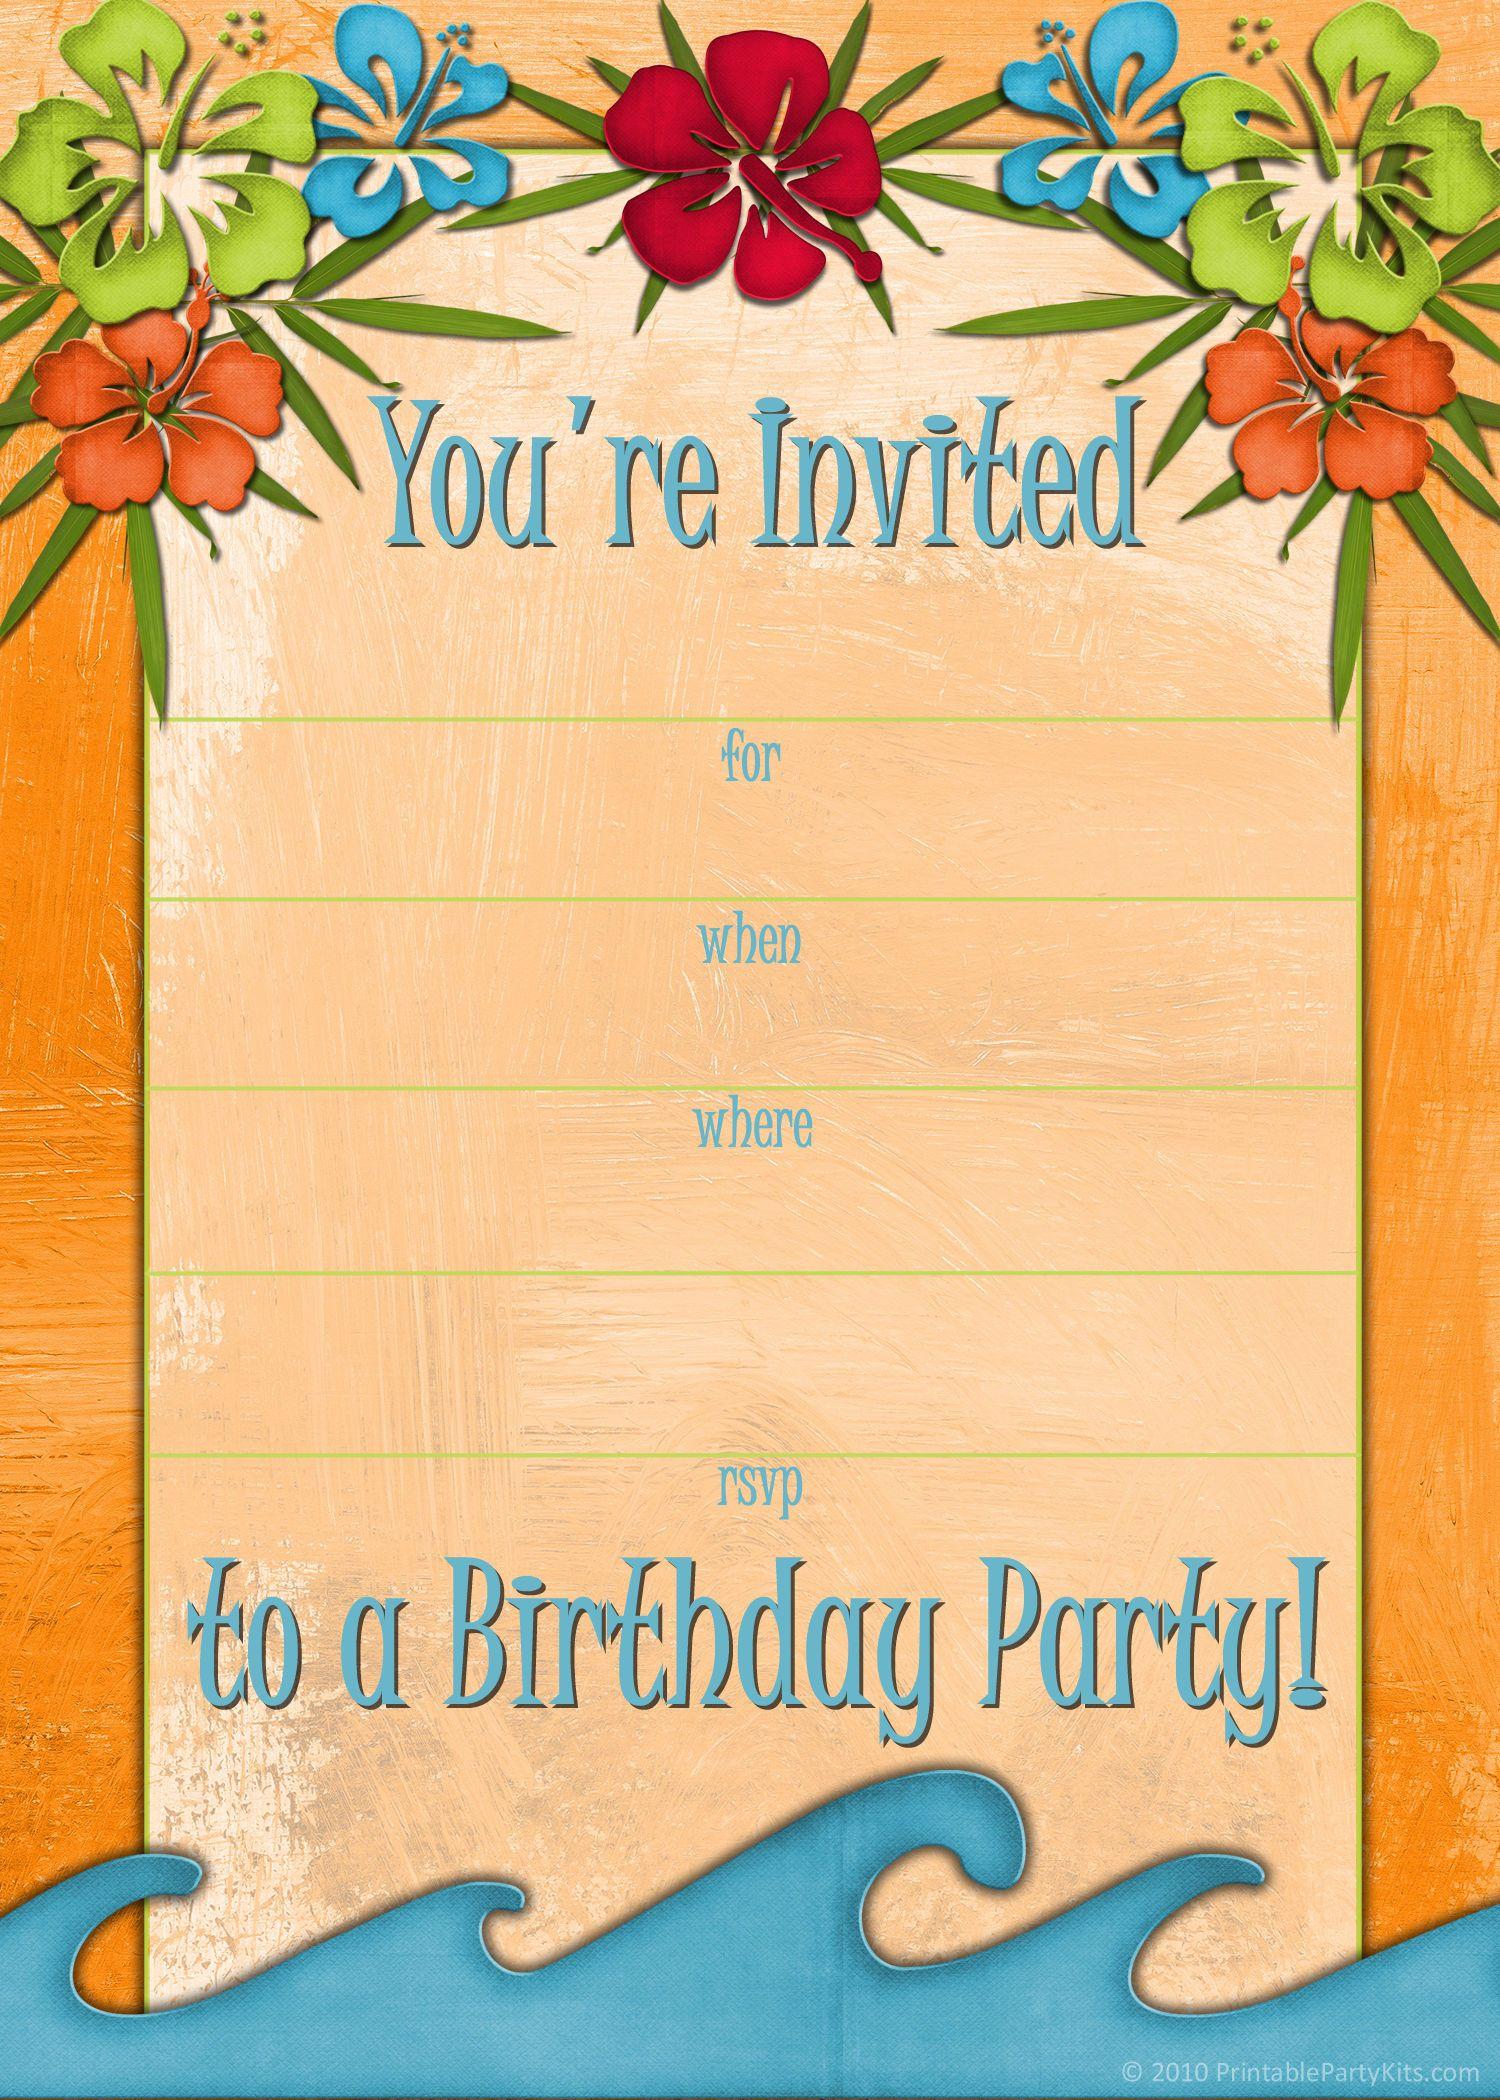 Free printable beach party luau and bbq invitations